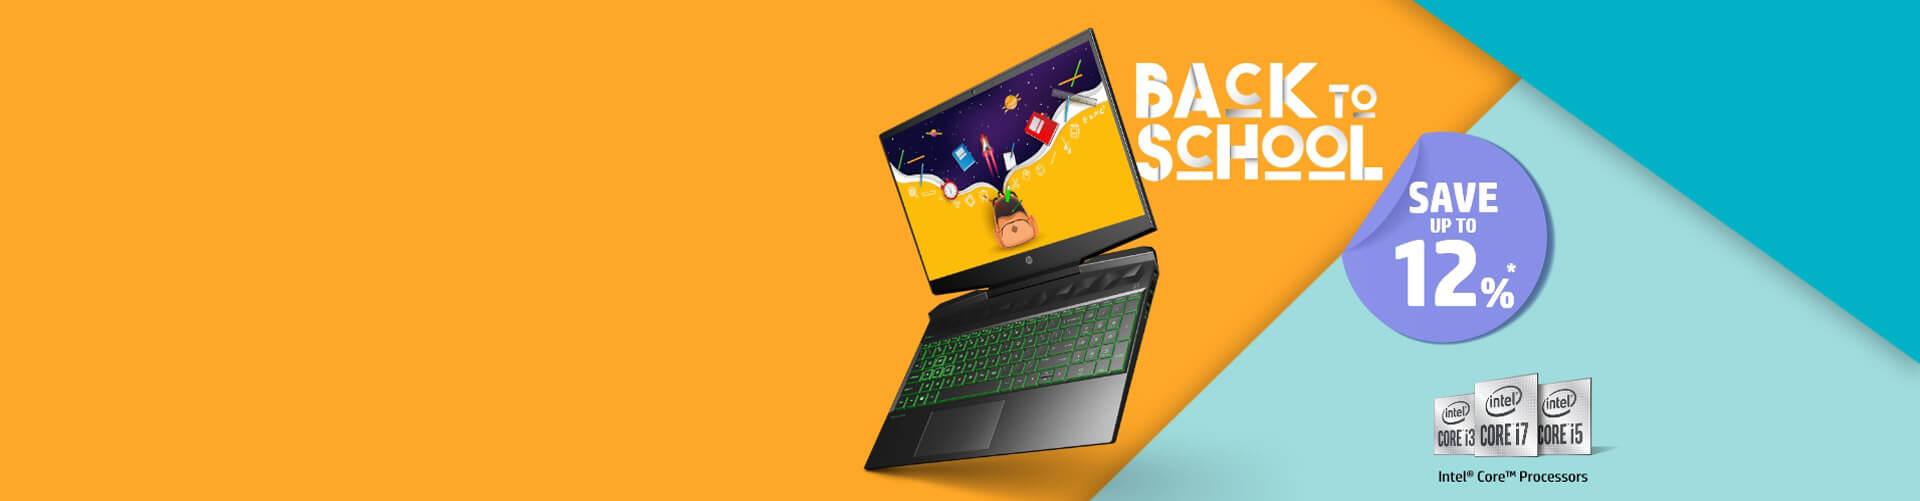 laptops-tablets/personal-laptops/student-laptops.html